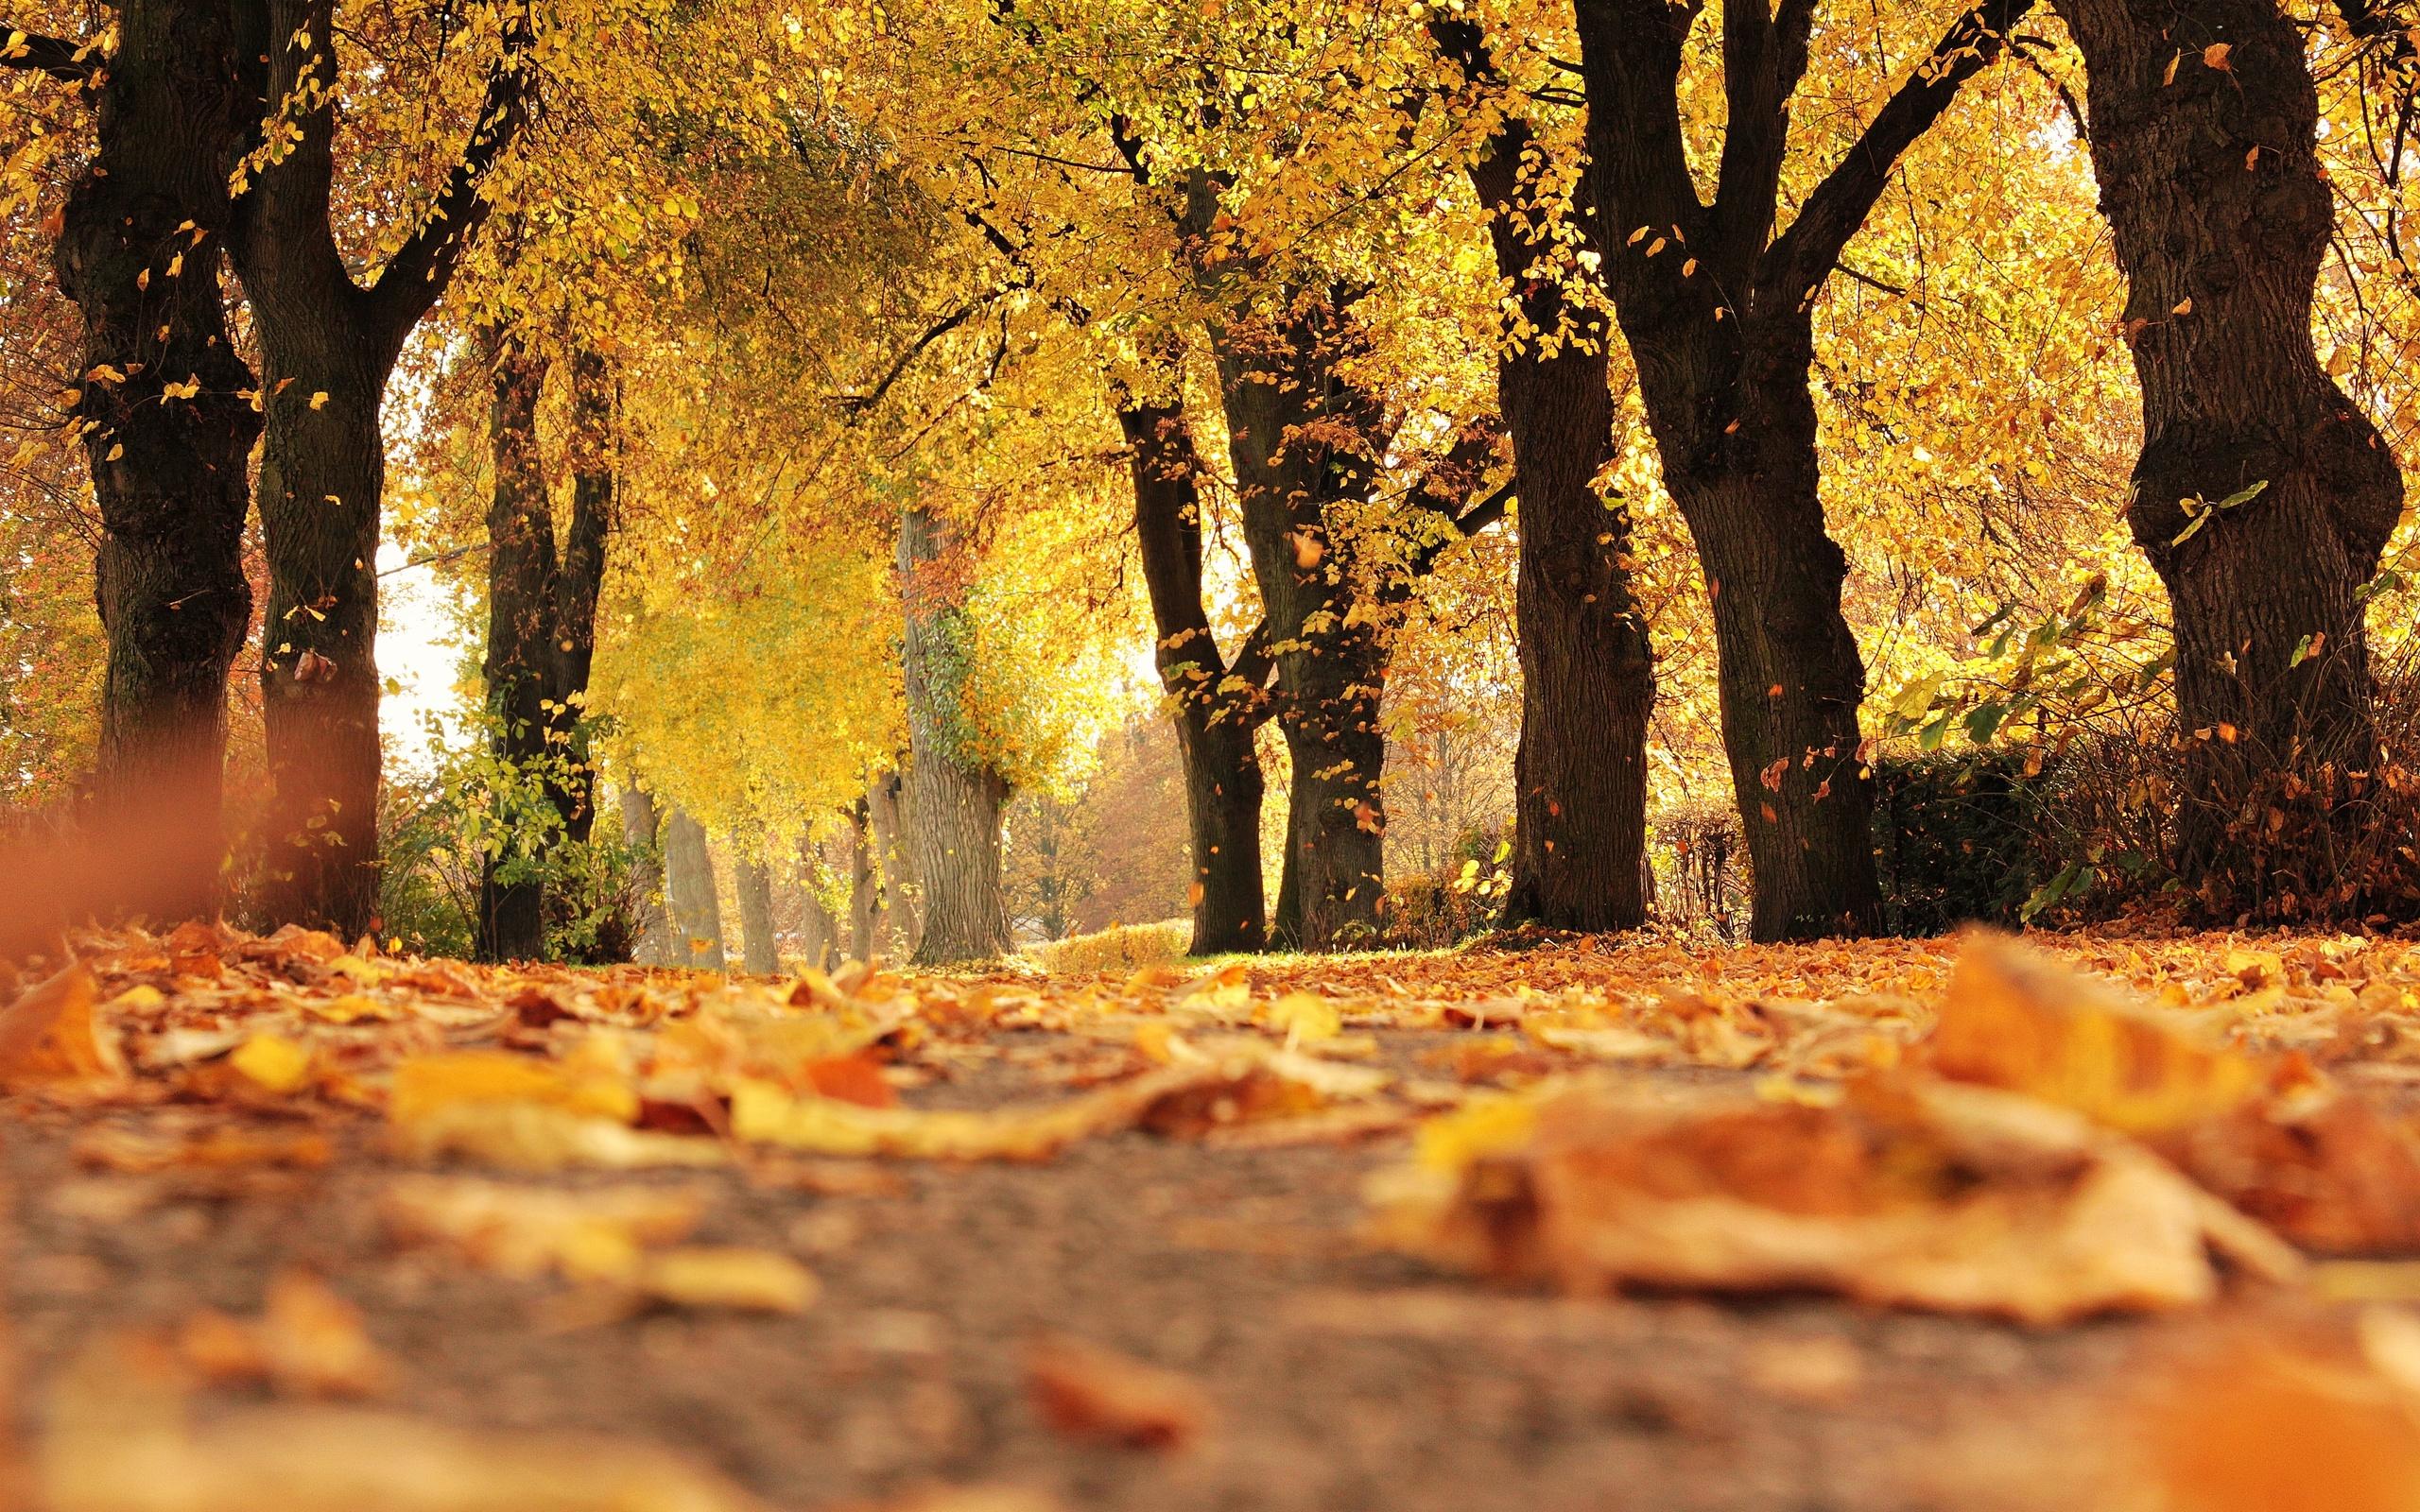 красивое фото про осень появились времена